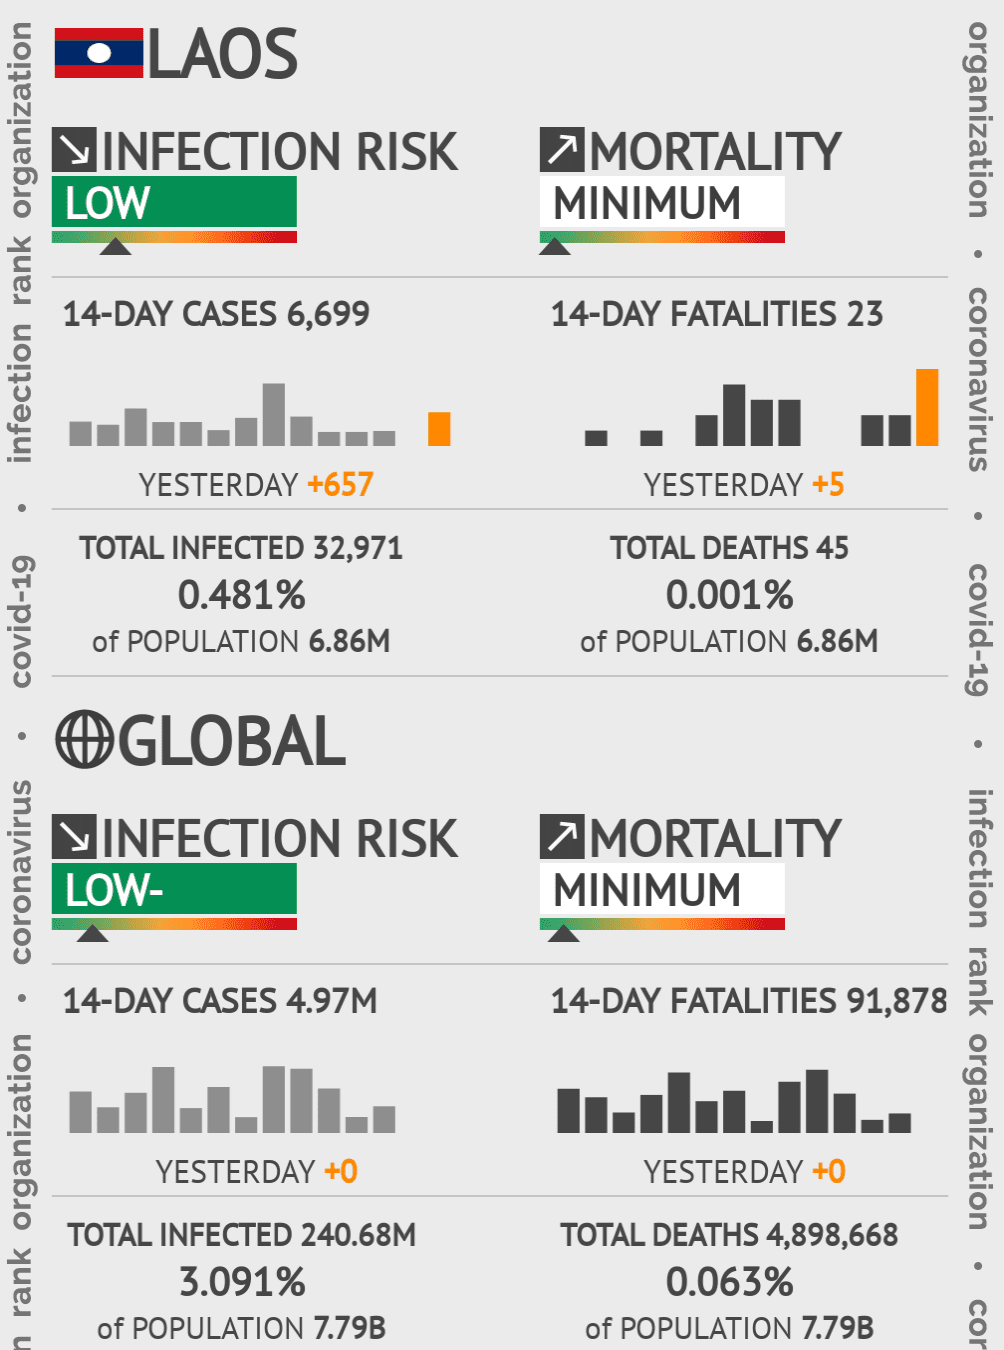 Laos Coronavirus Covid-19 Risk of Infection on November 24, 2020